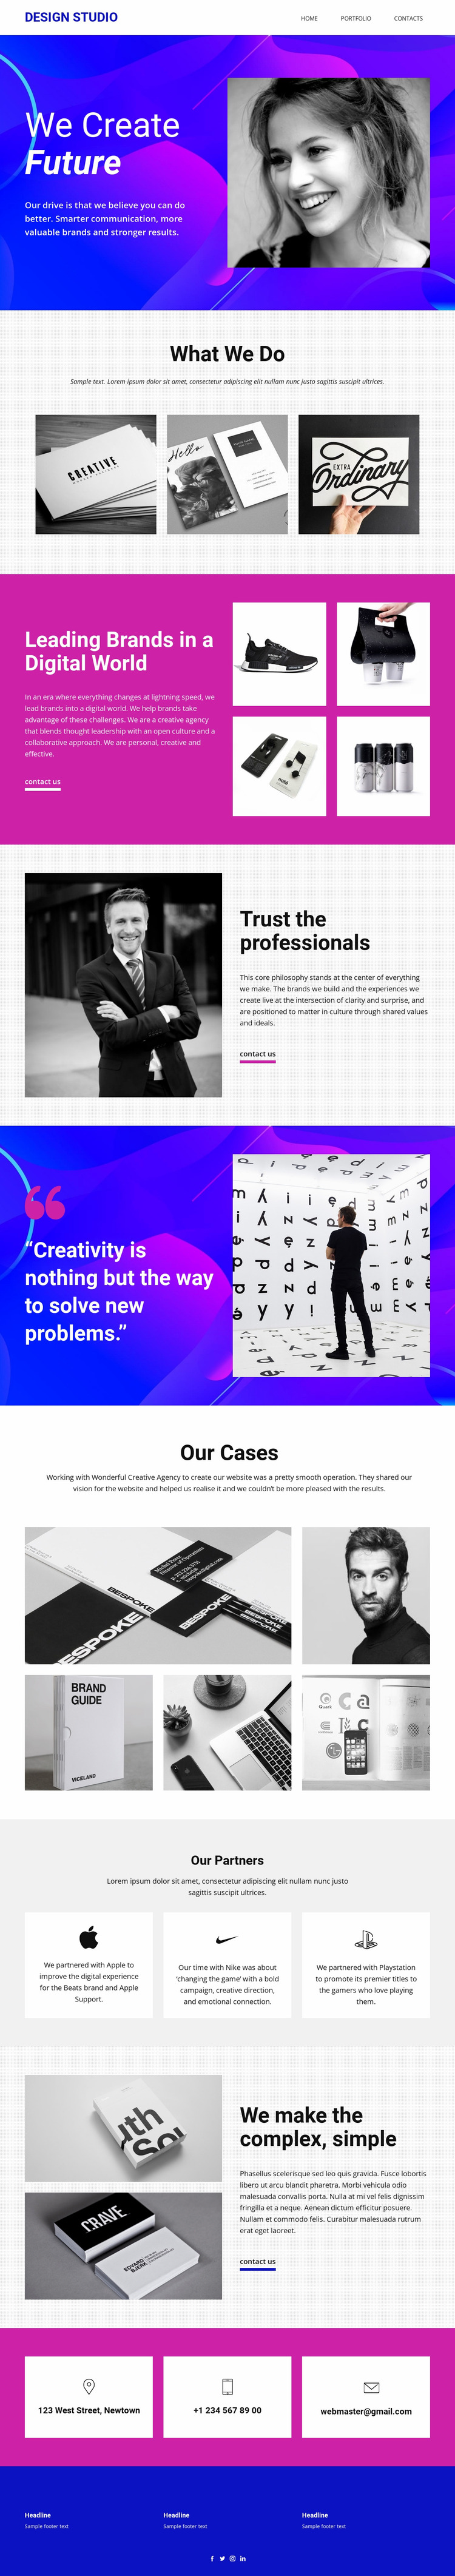 We develop the brand's core Website Mockup